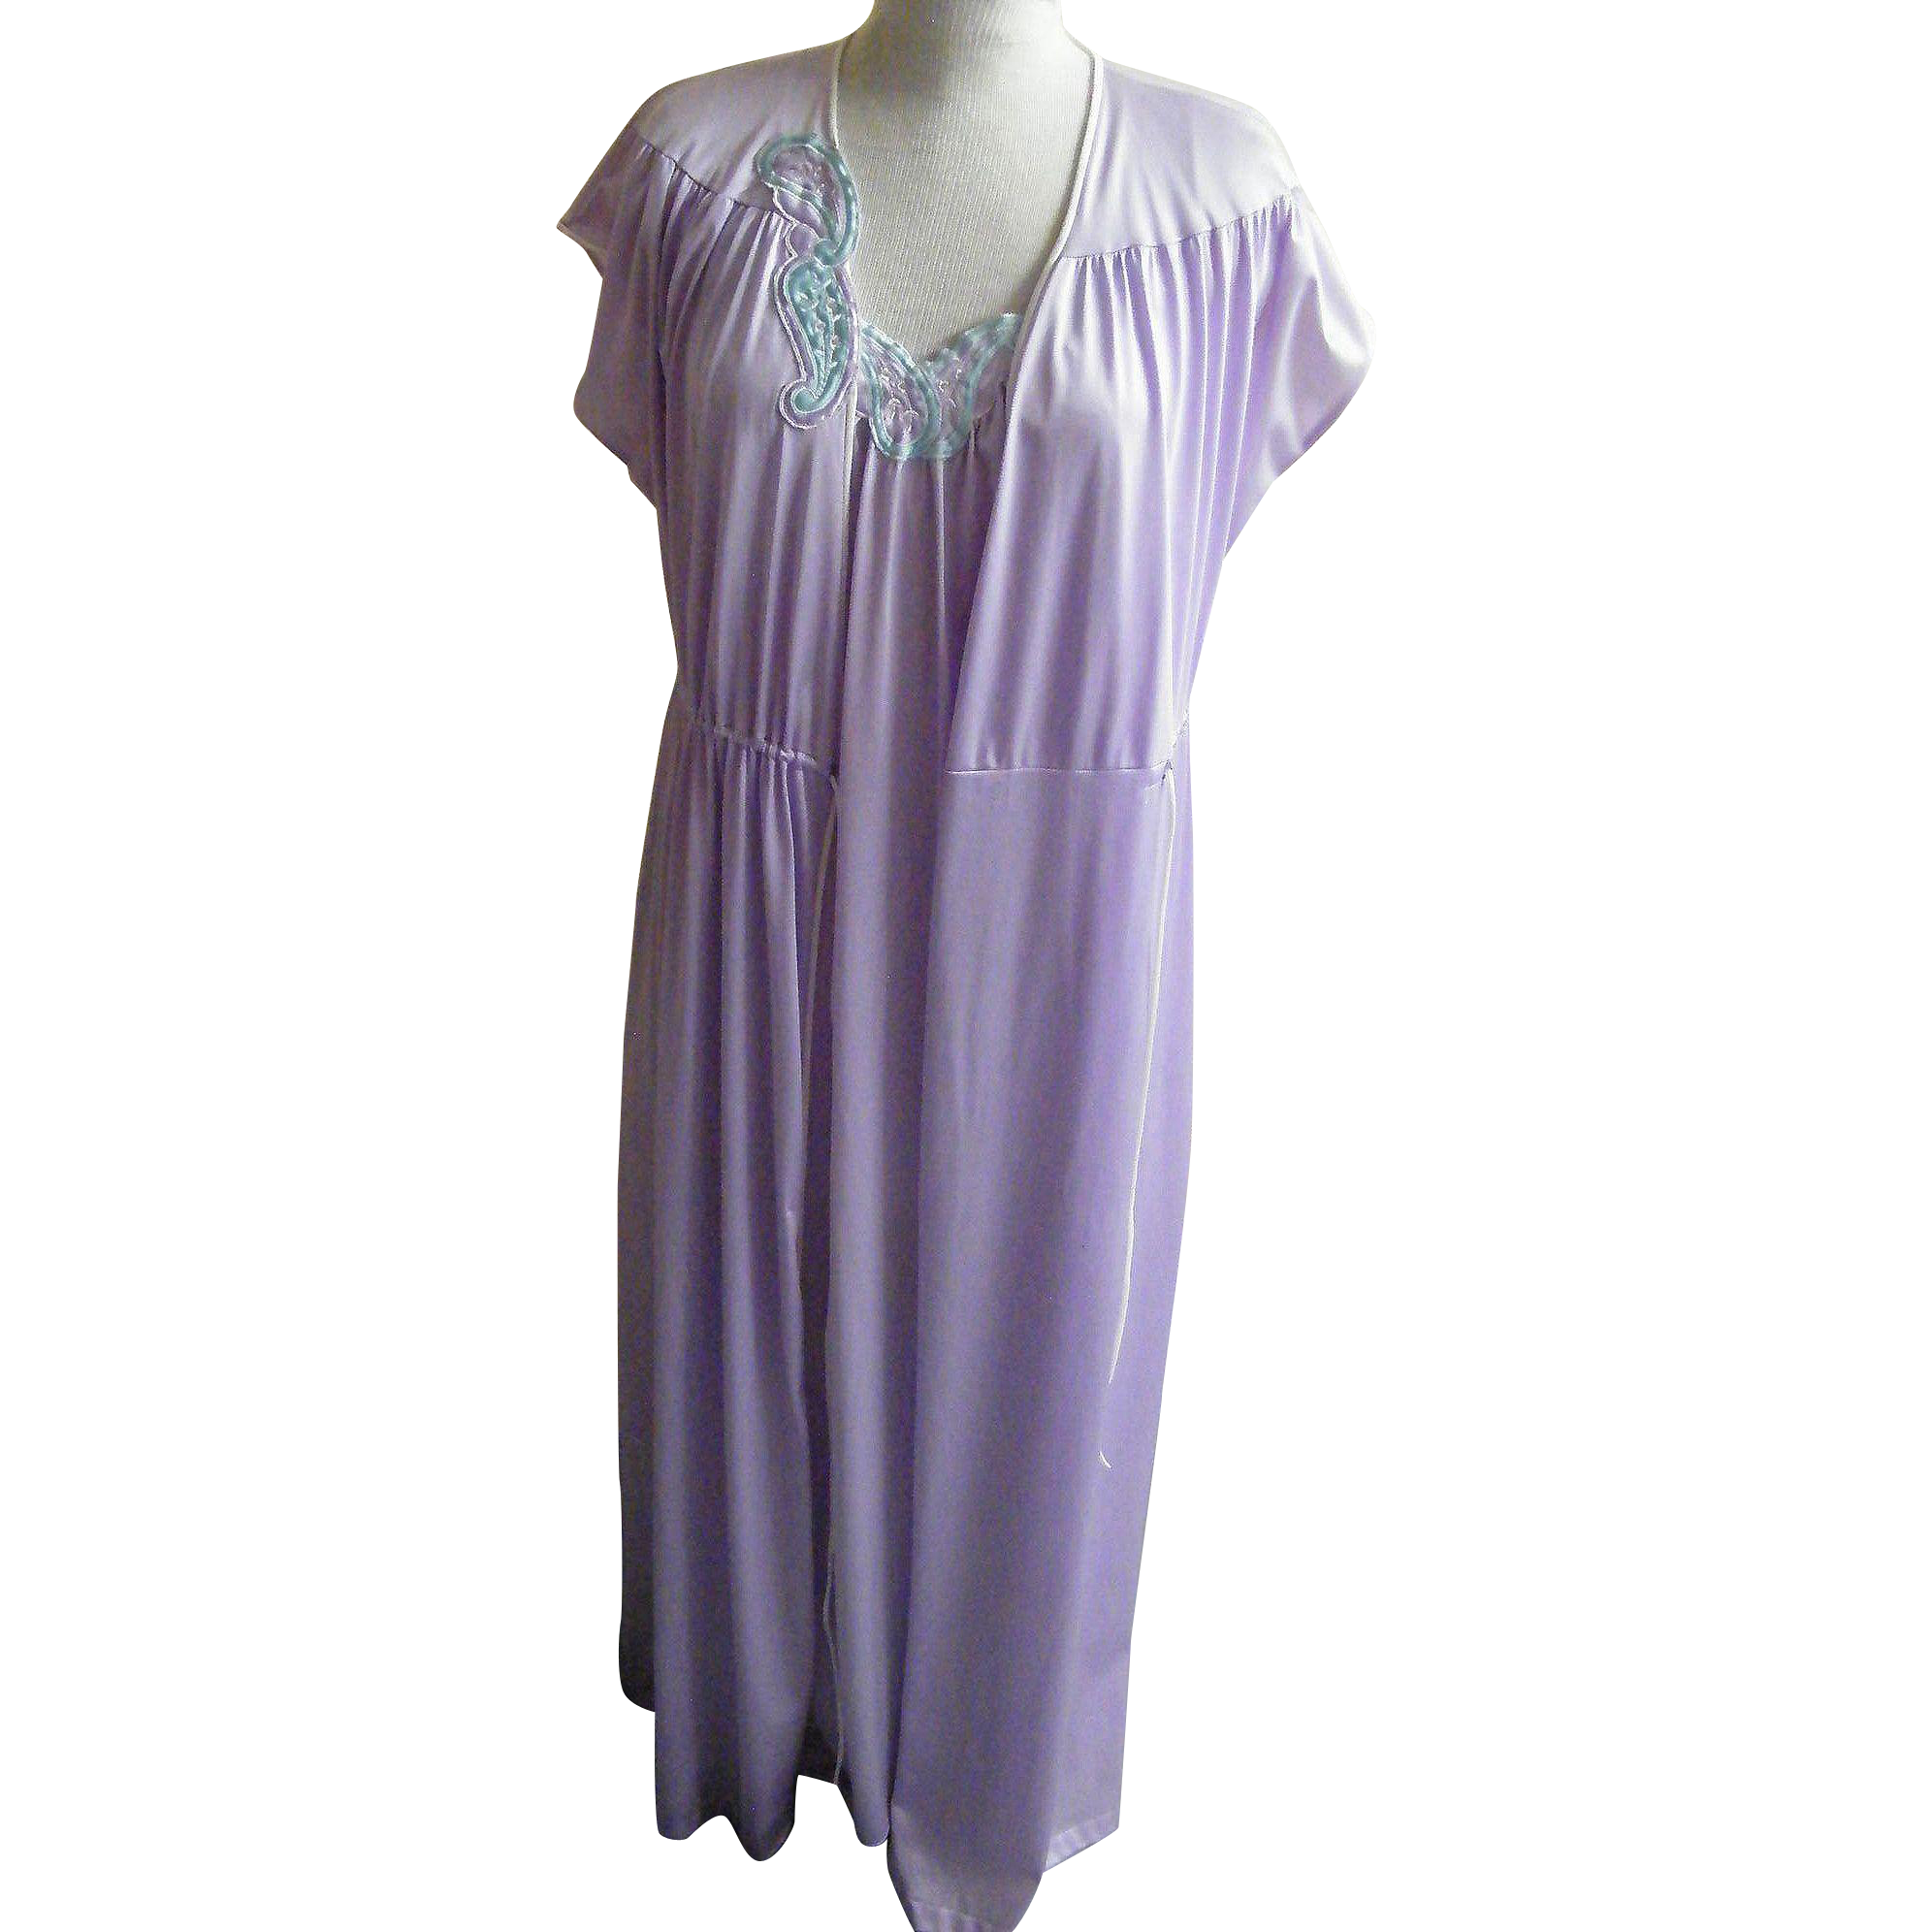 Nylon Tricot Nightgown - Free Hd Tube Porn-2907